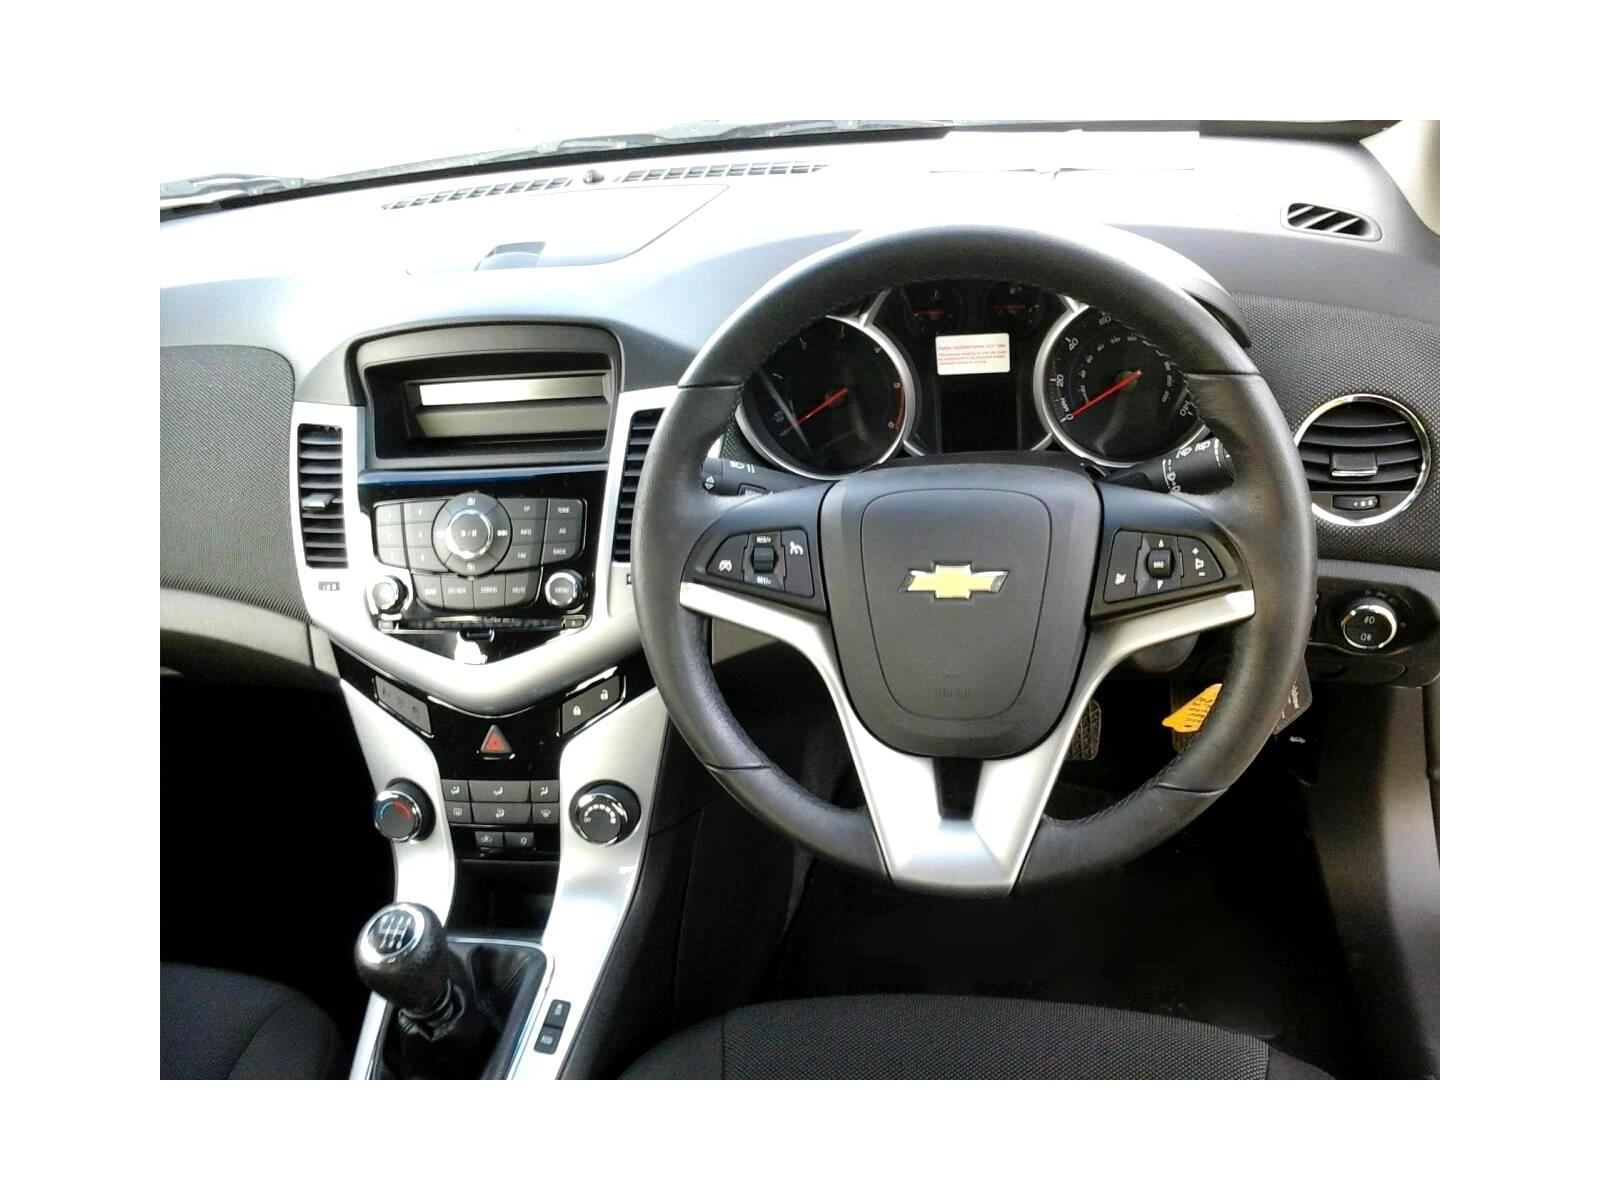 Chevrolet cruze 2012 on mirror rear view diesel manual for sale 2014 chevrolet cruze interior rear view mirror warranty 5133106 publicscrutiny Images